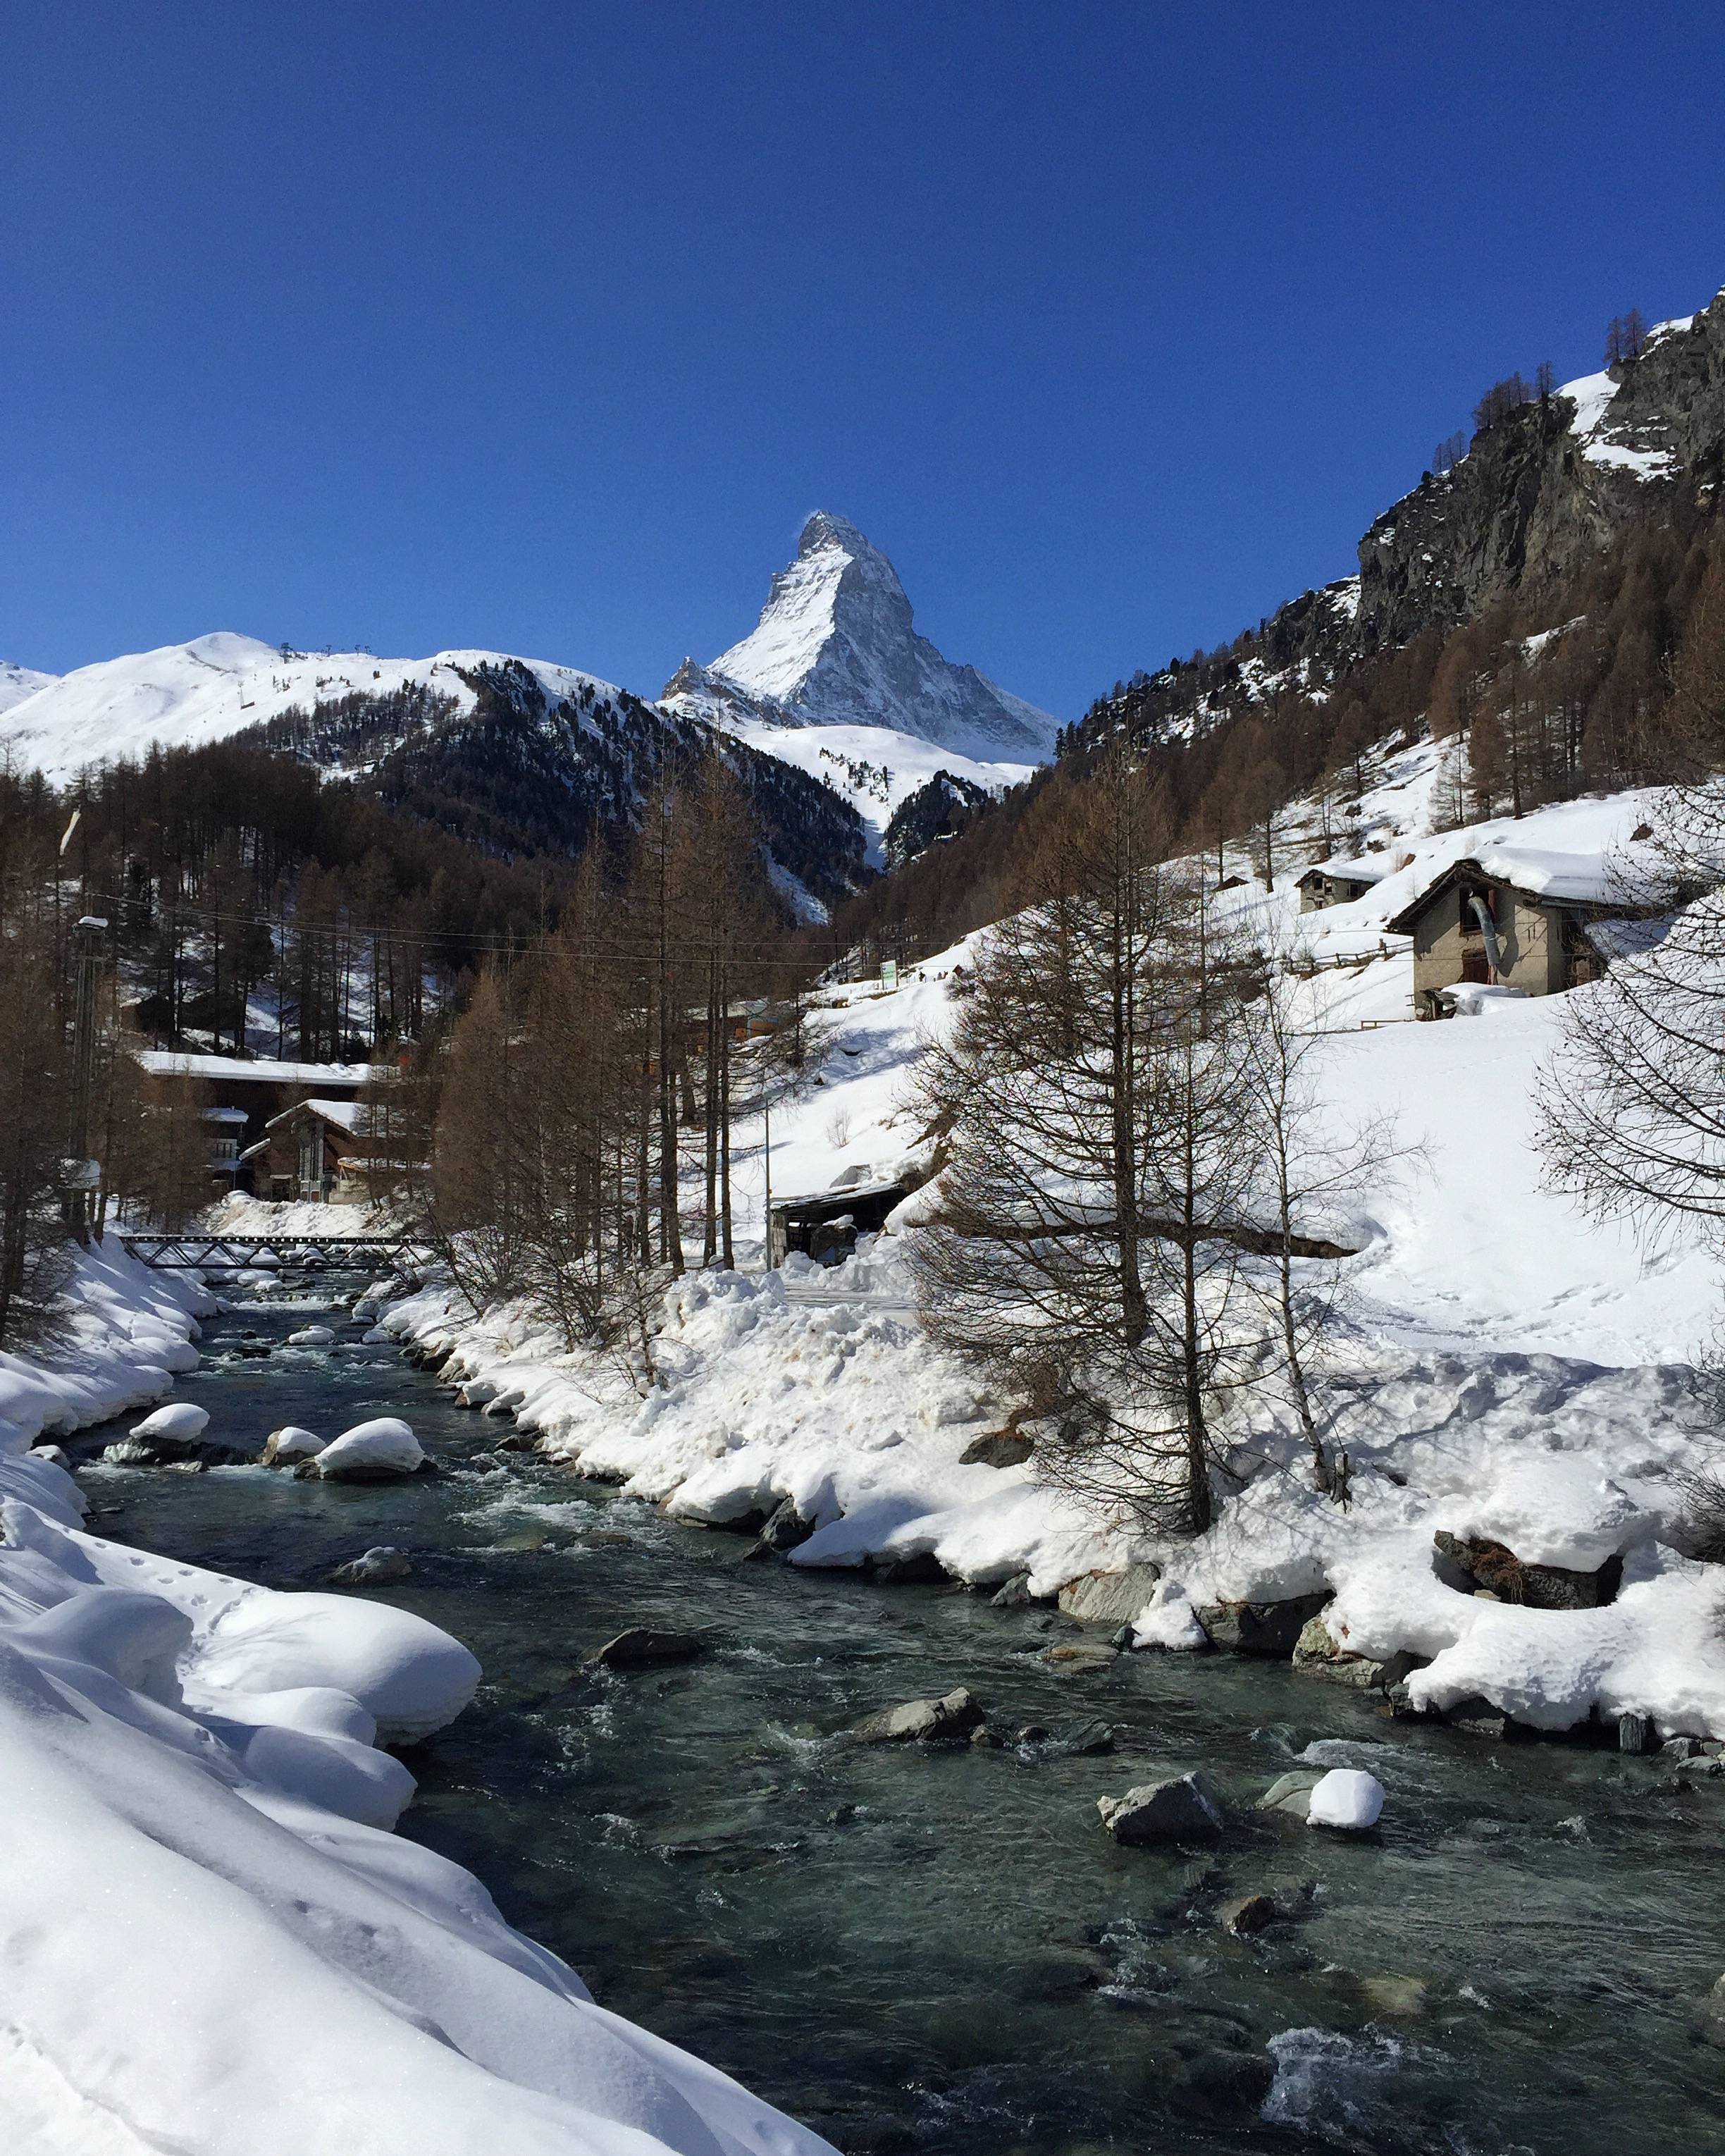 Photo 1: Zermatt : vue sur la montagne de Toblerone !